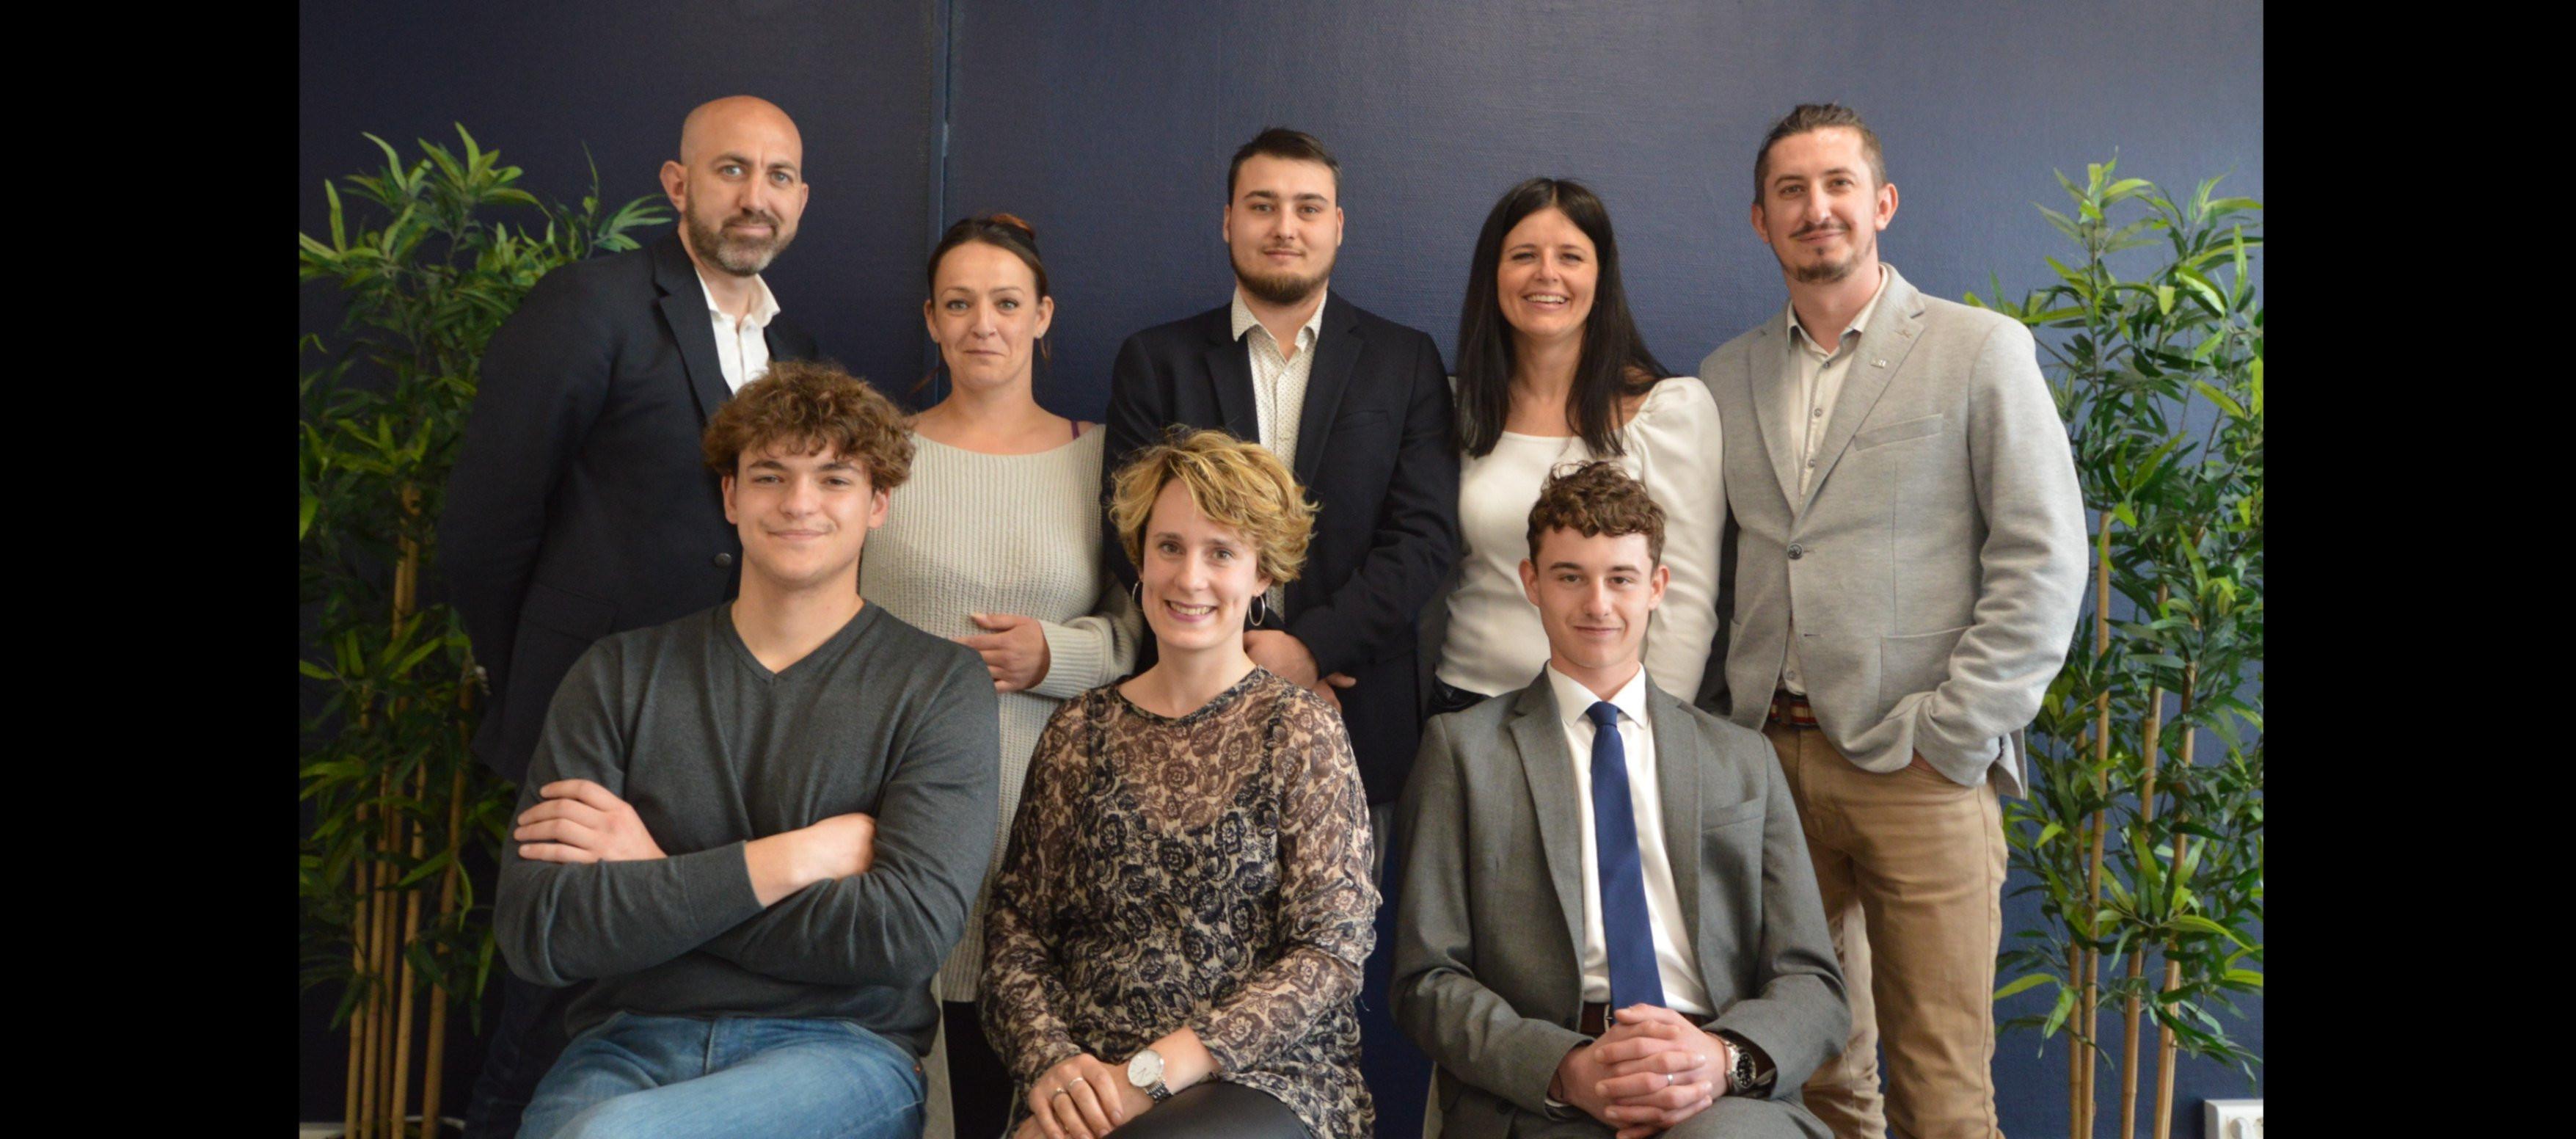 Agence Guy Hoquet VILLEPREUX